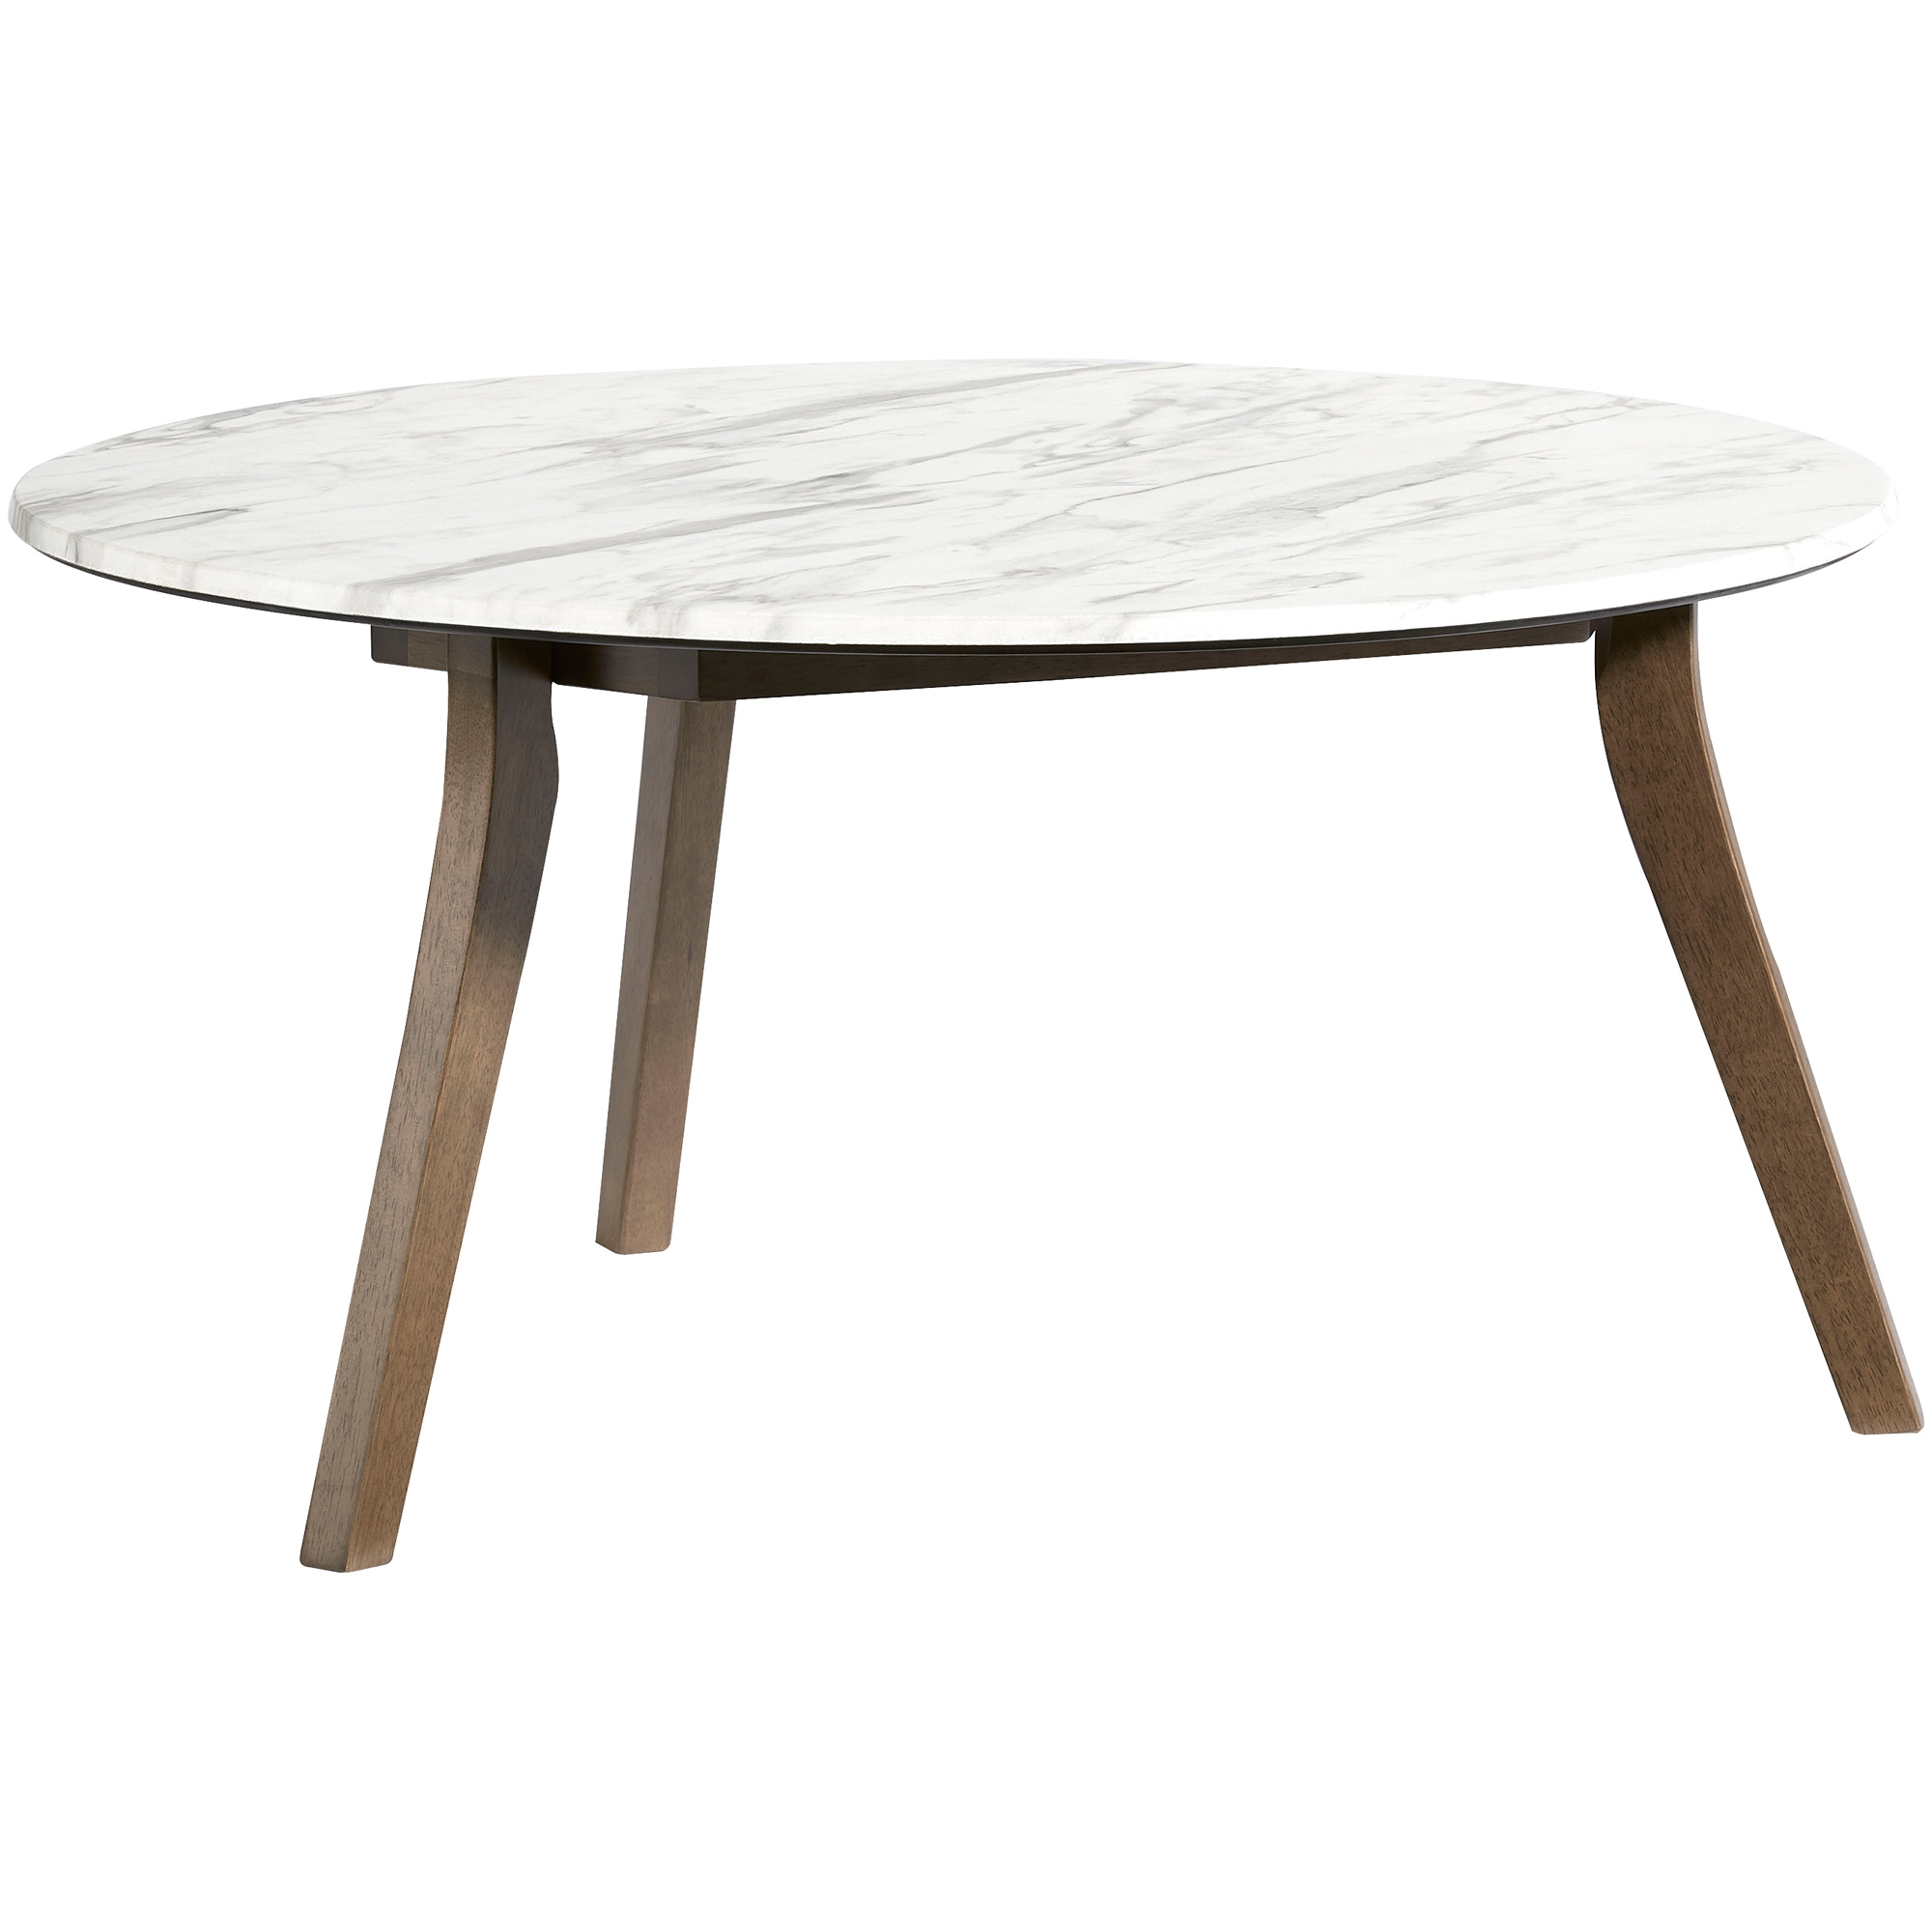 Progressive Furniture Inc. | Pixie White Round Coffee Table